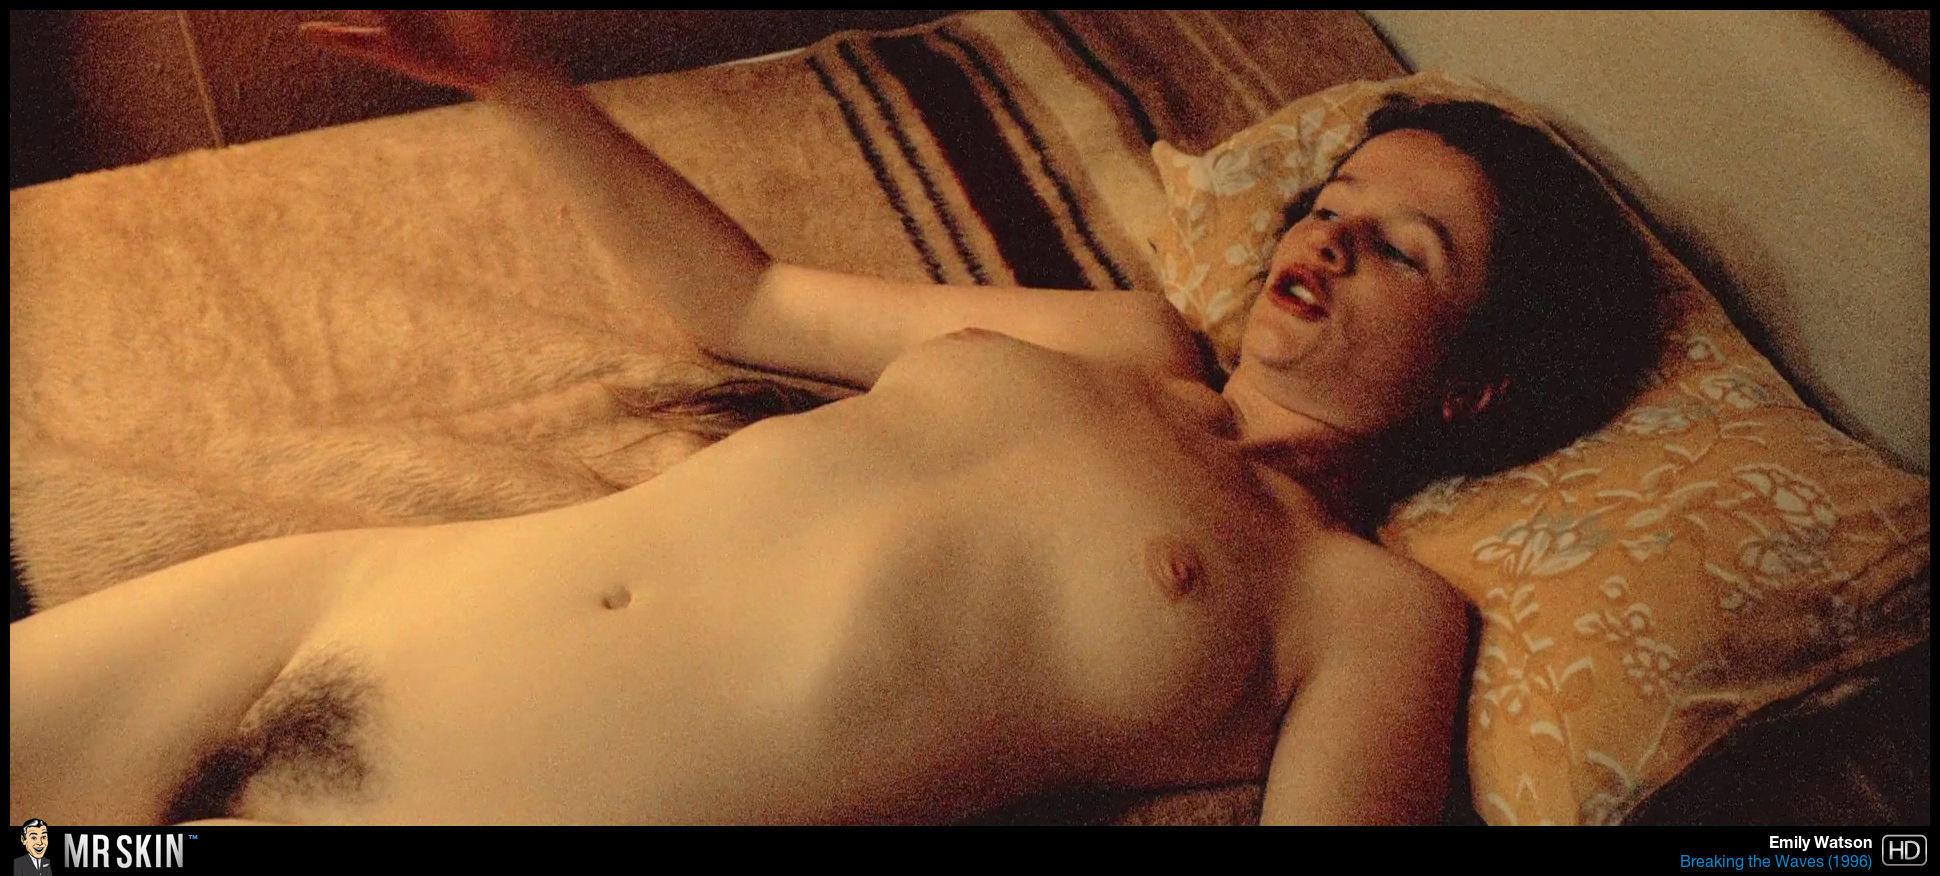 phat beach mr skin nude movie jpg 1200x900